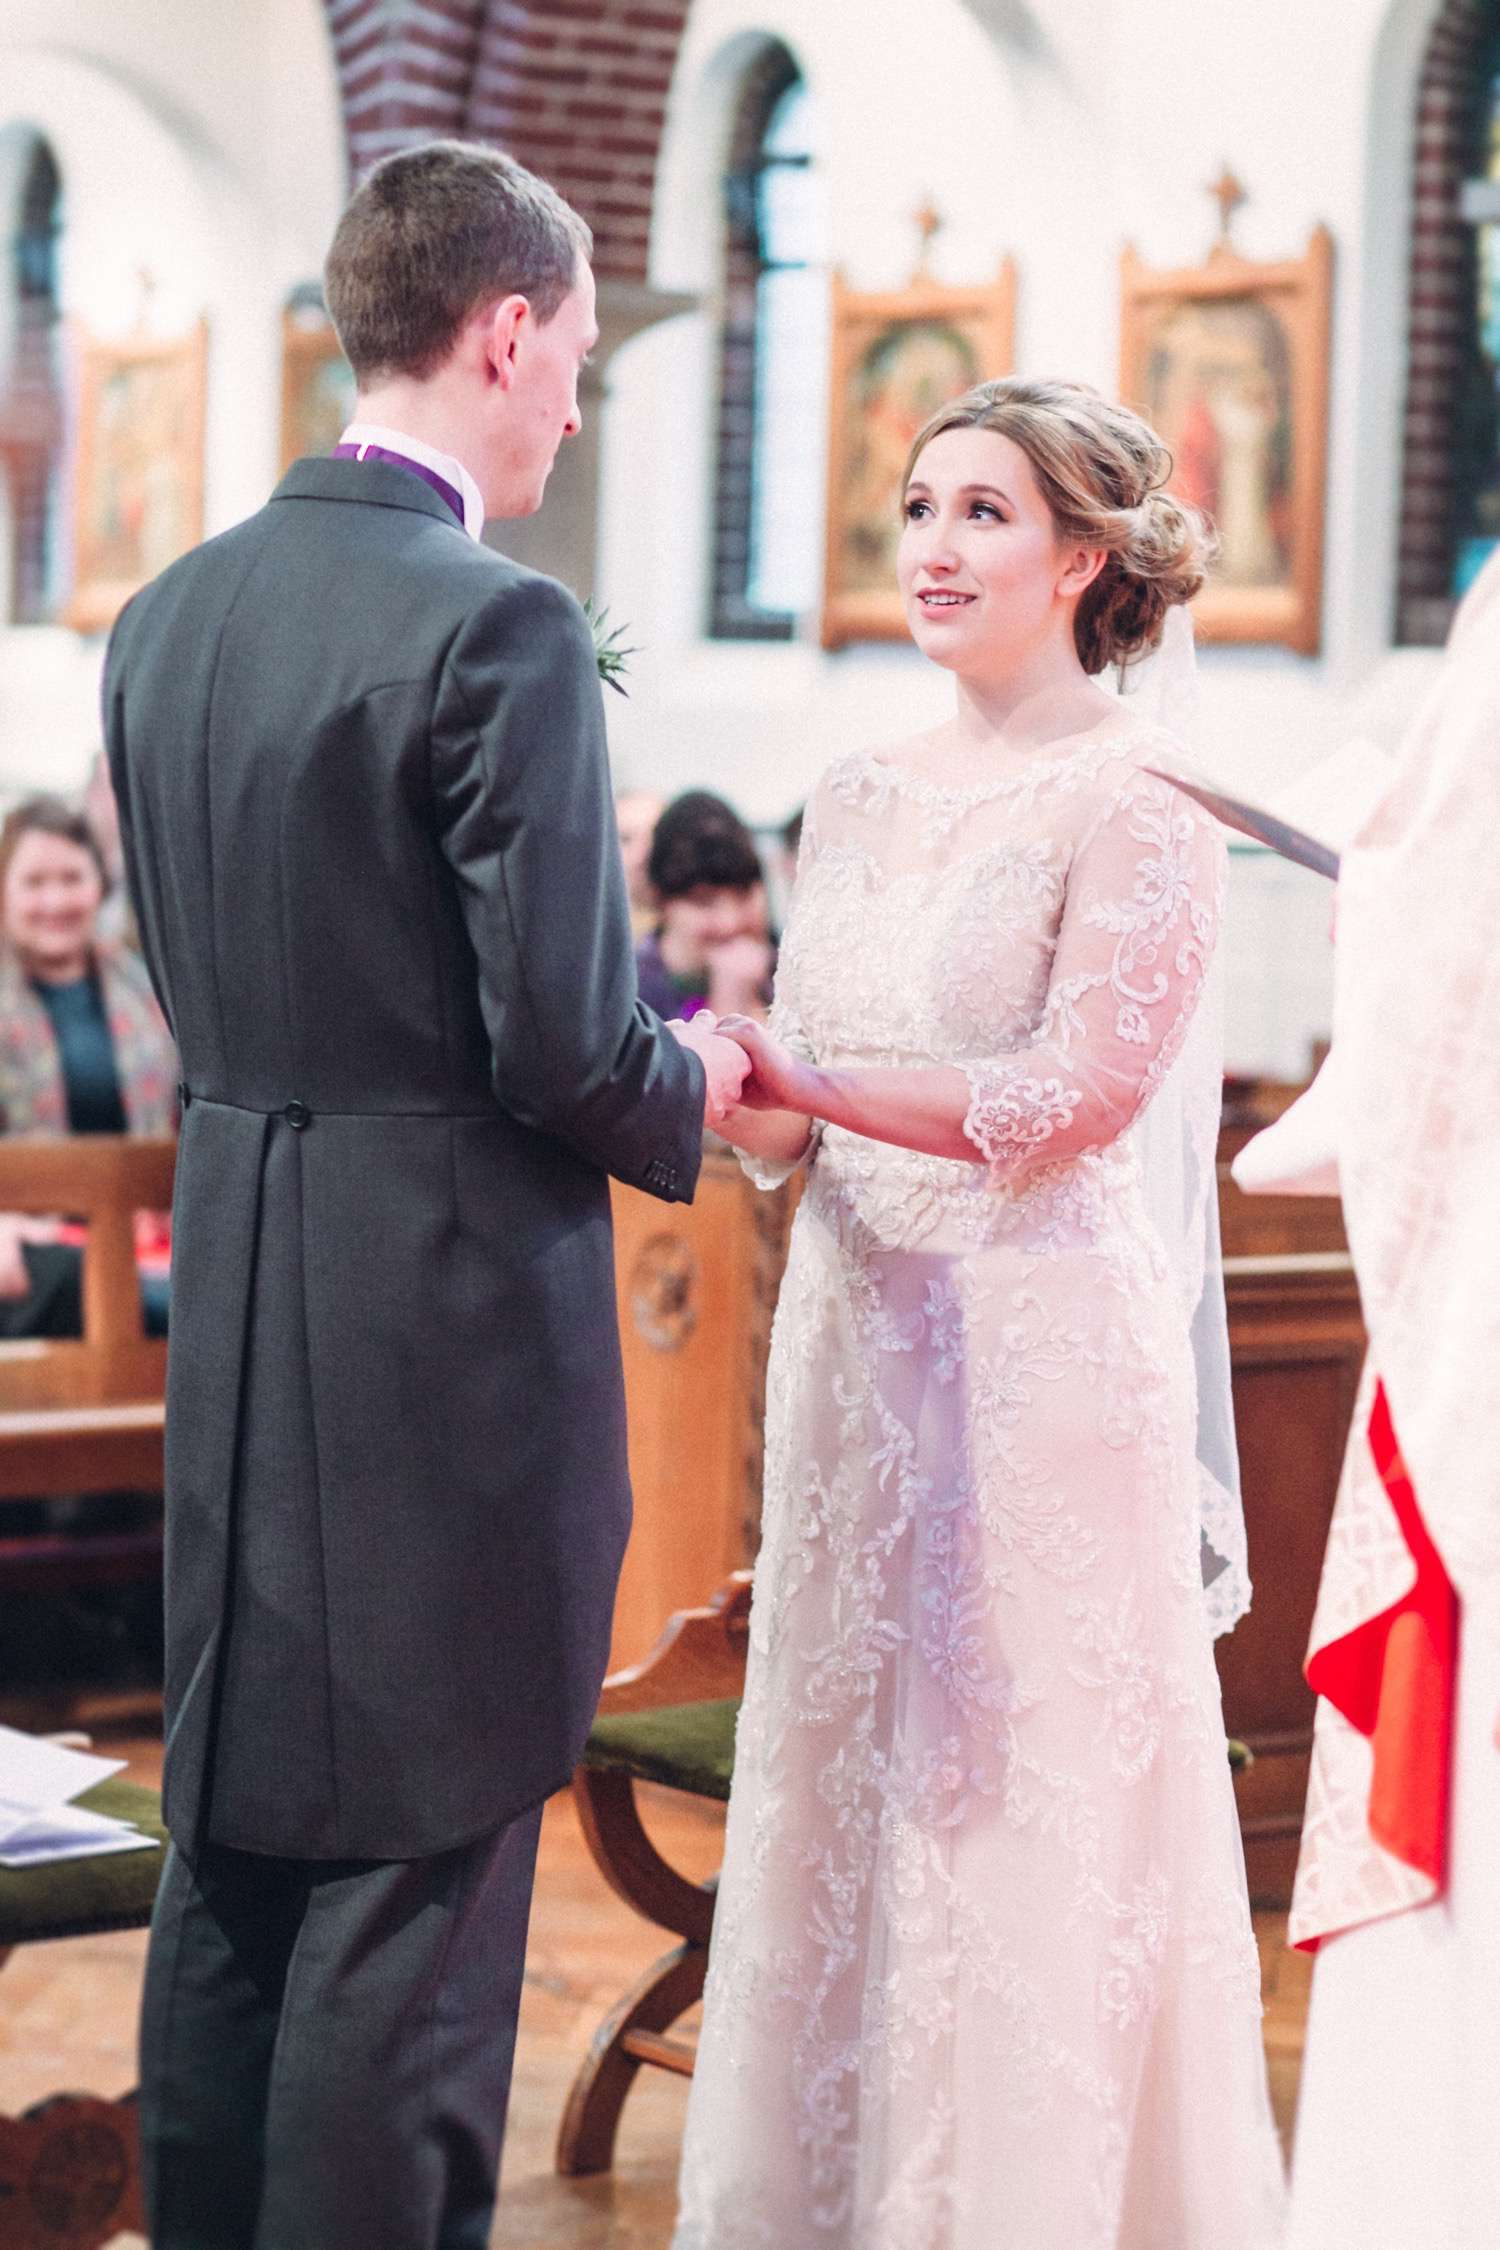 Eshott-Hall-Durham-Paul-Liddement-Wedding-Stories-14.jpg